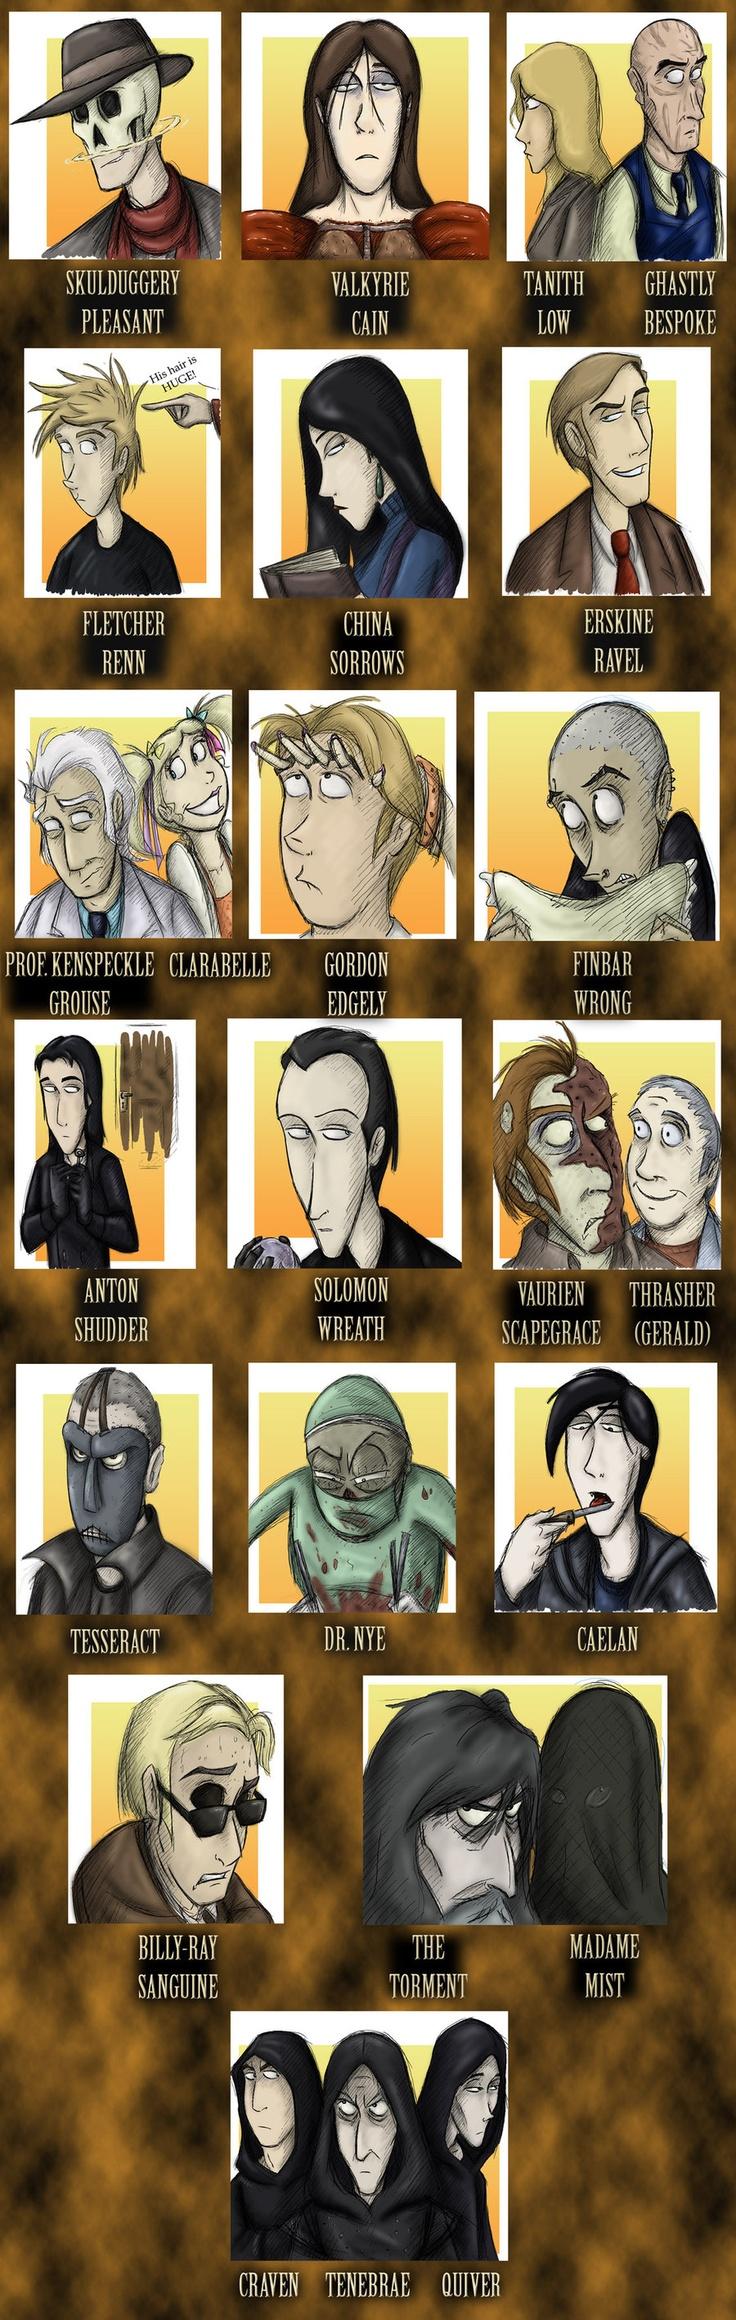 Skulduggery Pleasant book 5 cast of characters